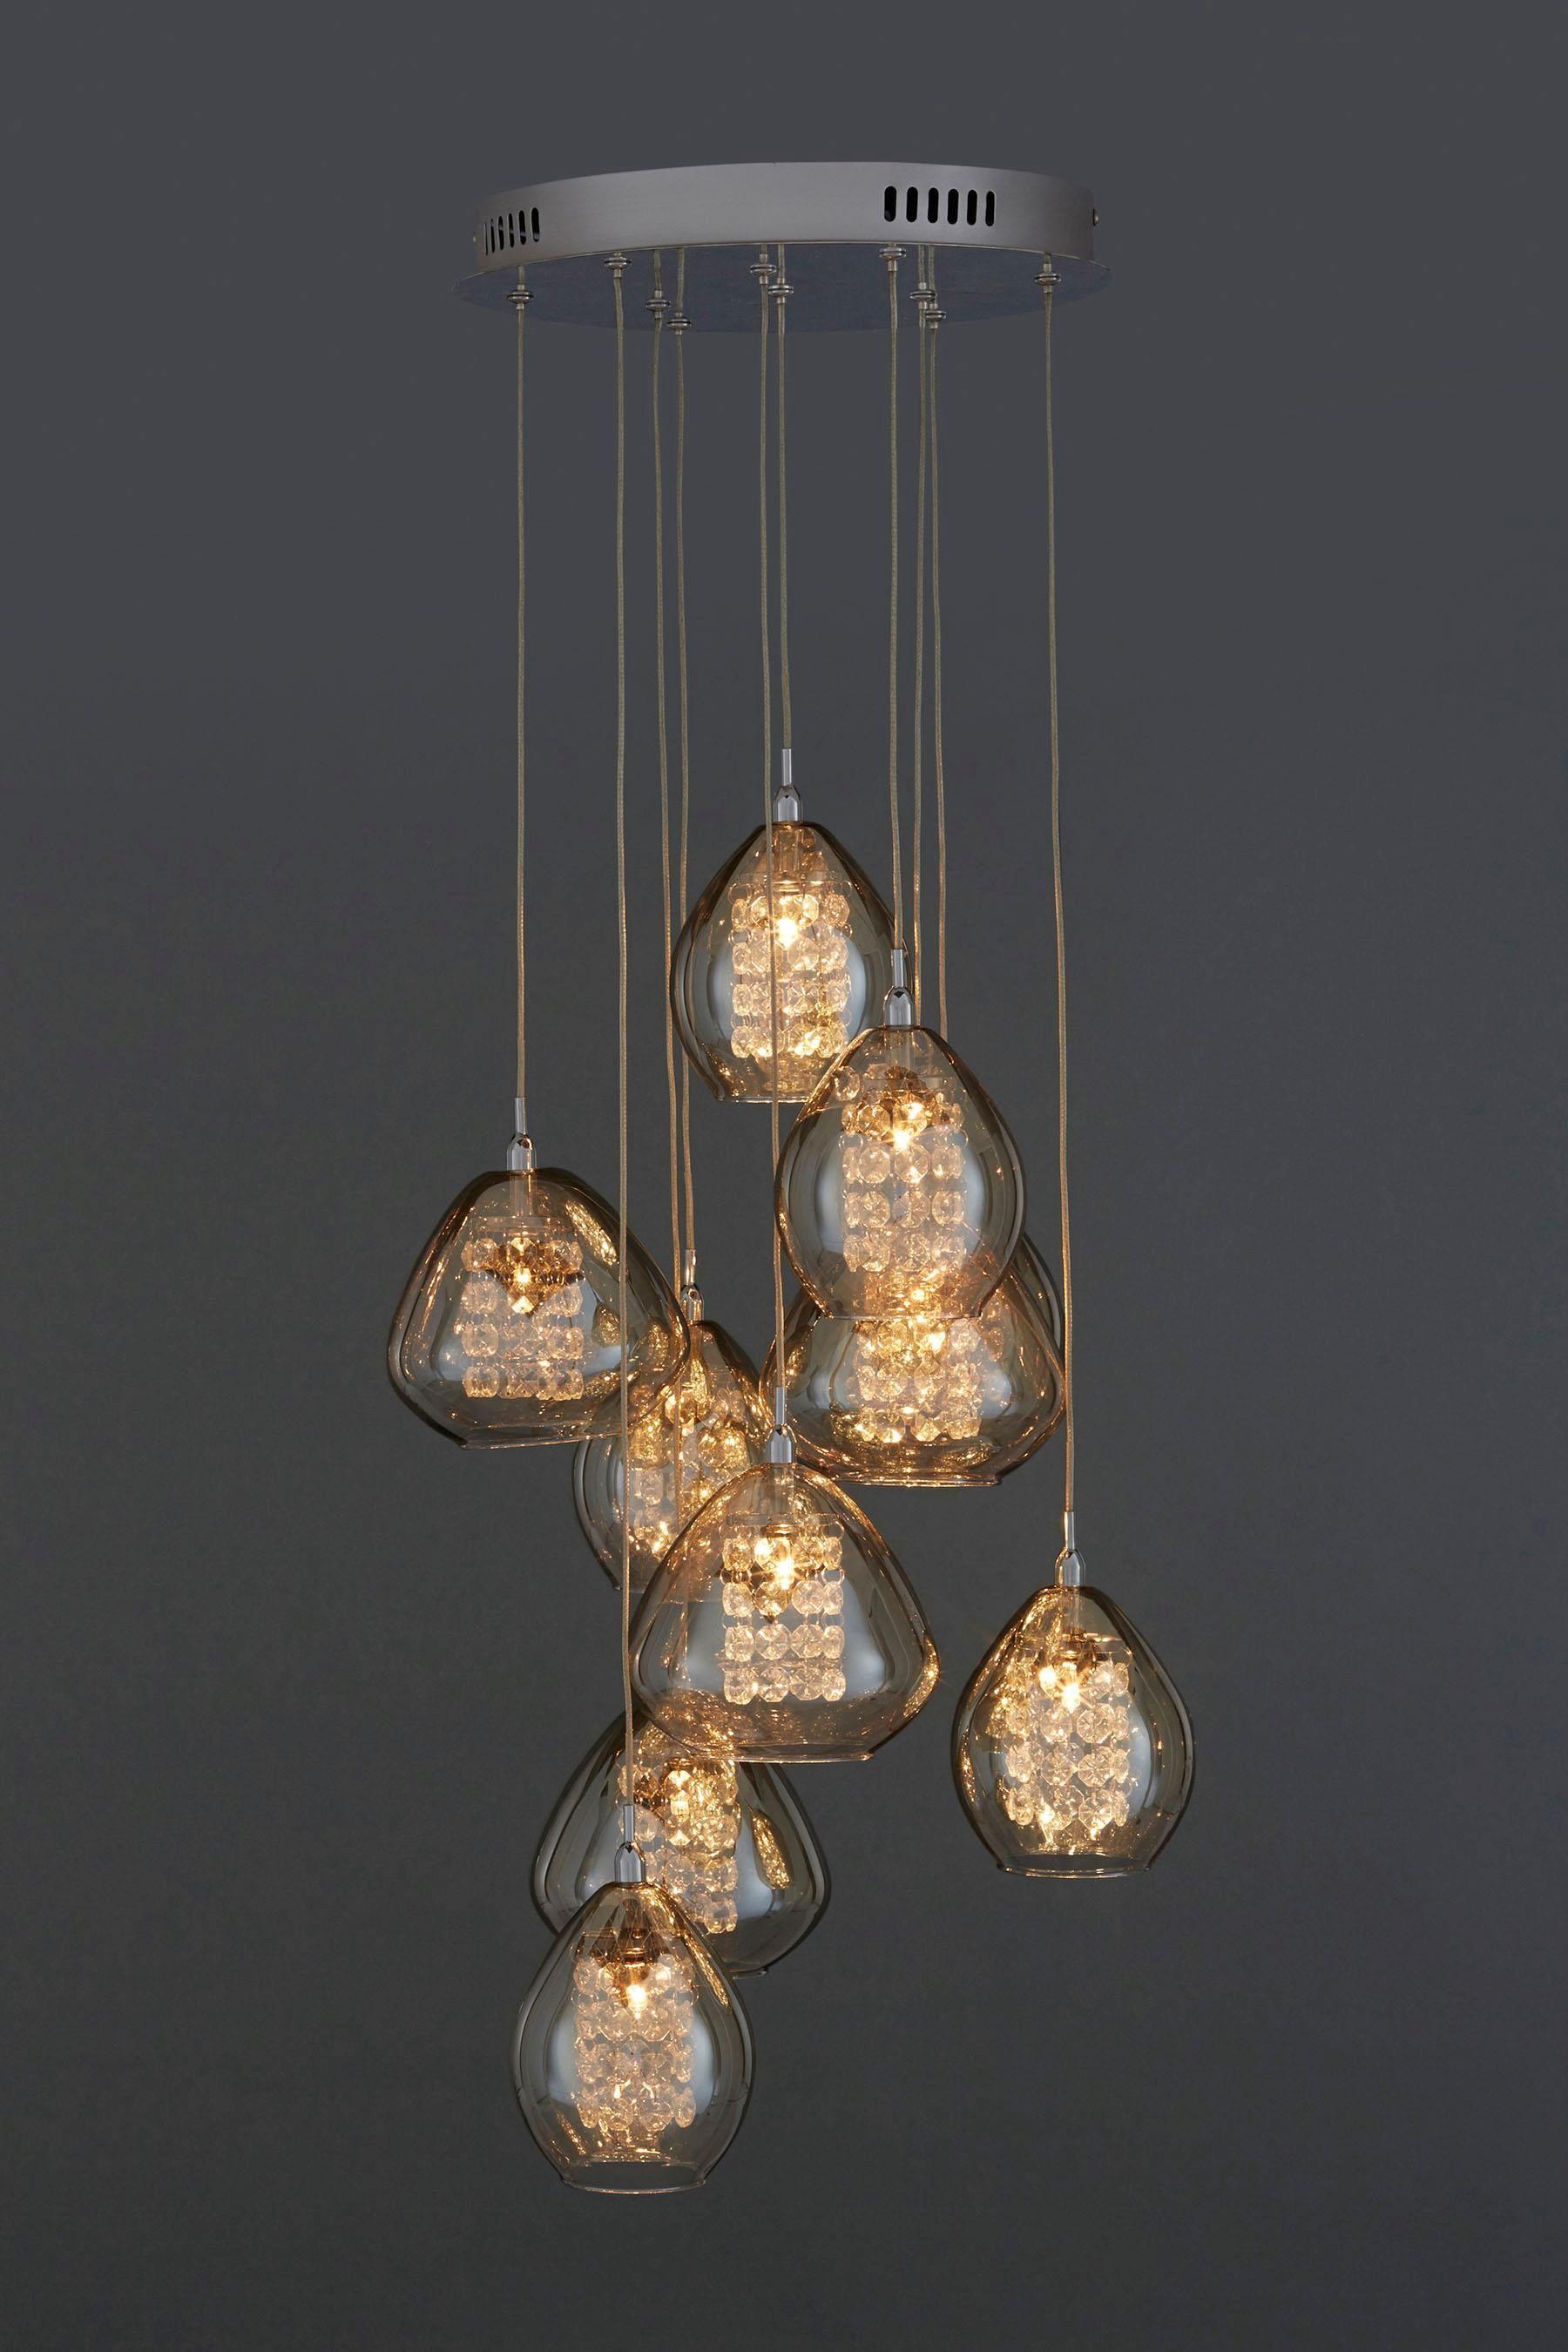 Ceiling Lights Next Light Shades